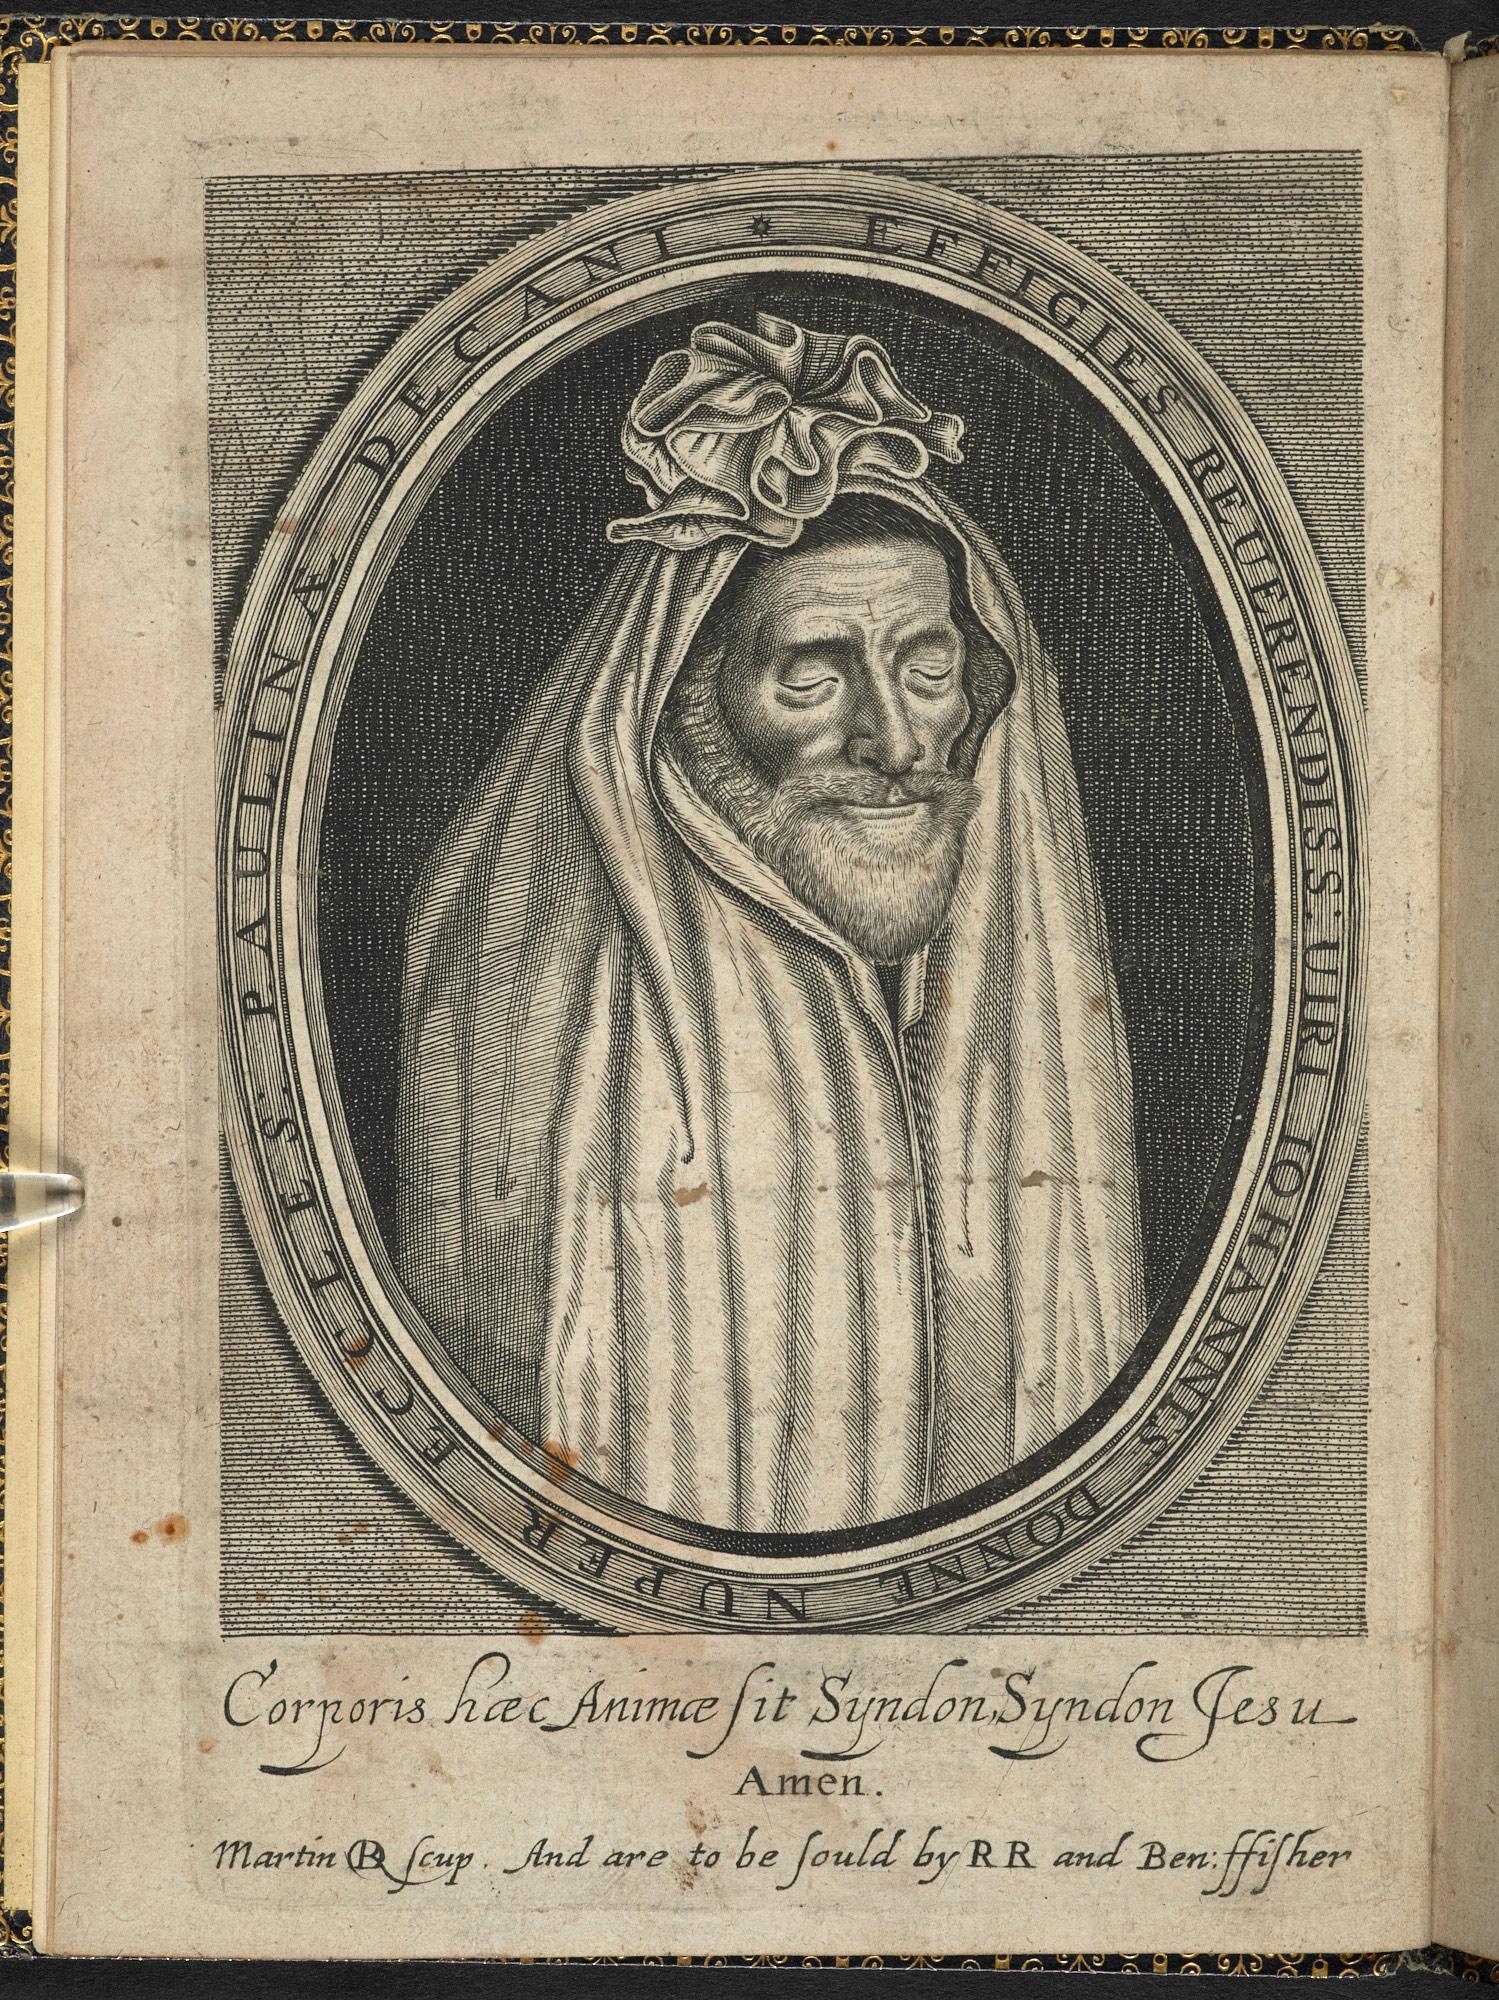 Death's Duel by John Donne